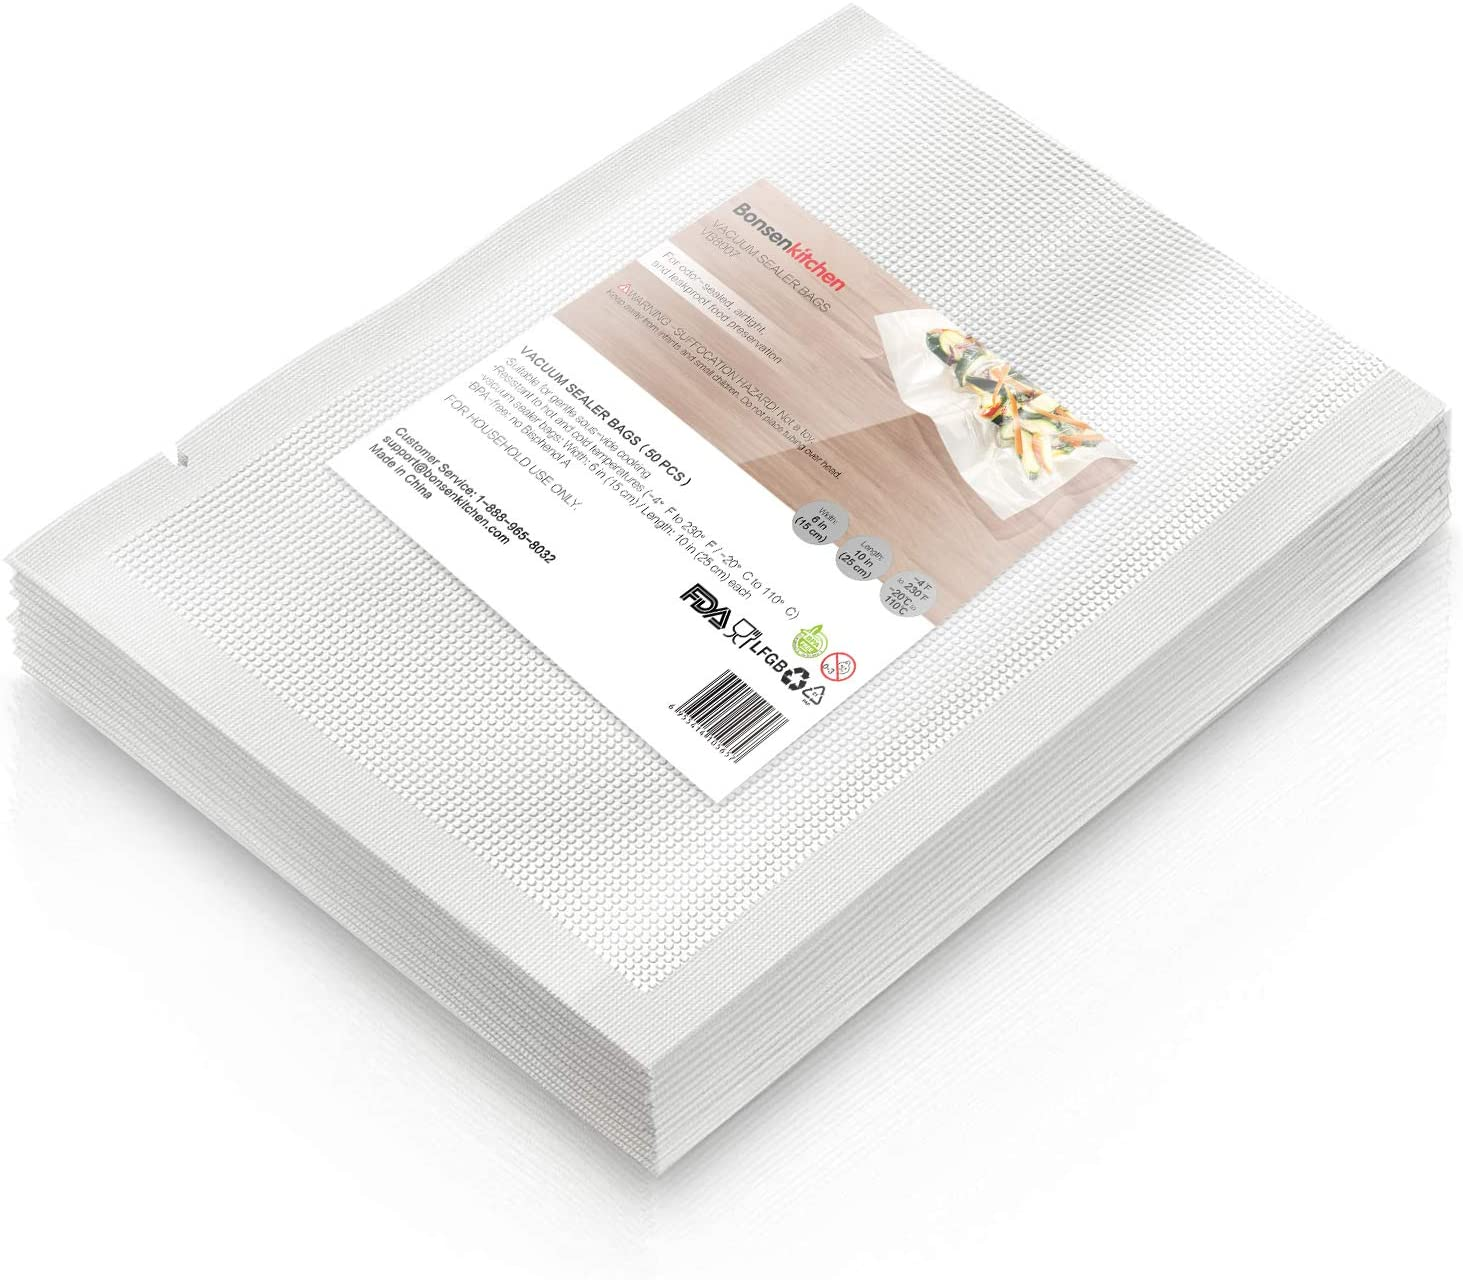 Heavy Duty Vacuum Sealer Bags For Food, 50 Pint 6